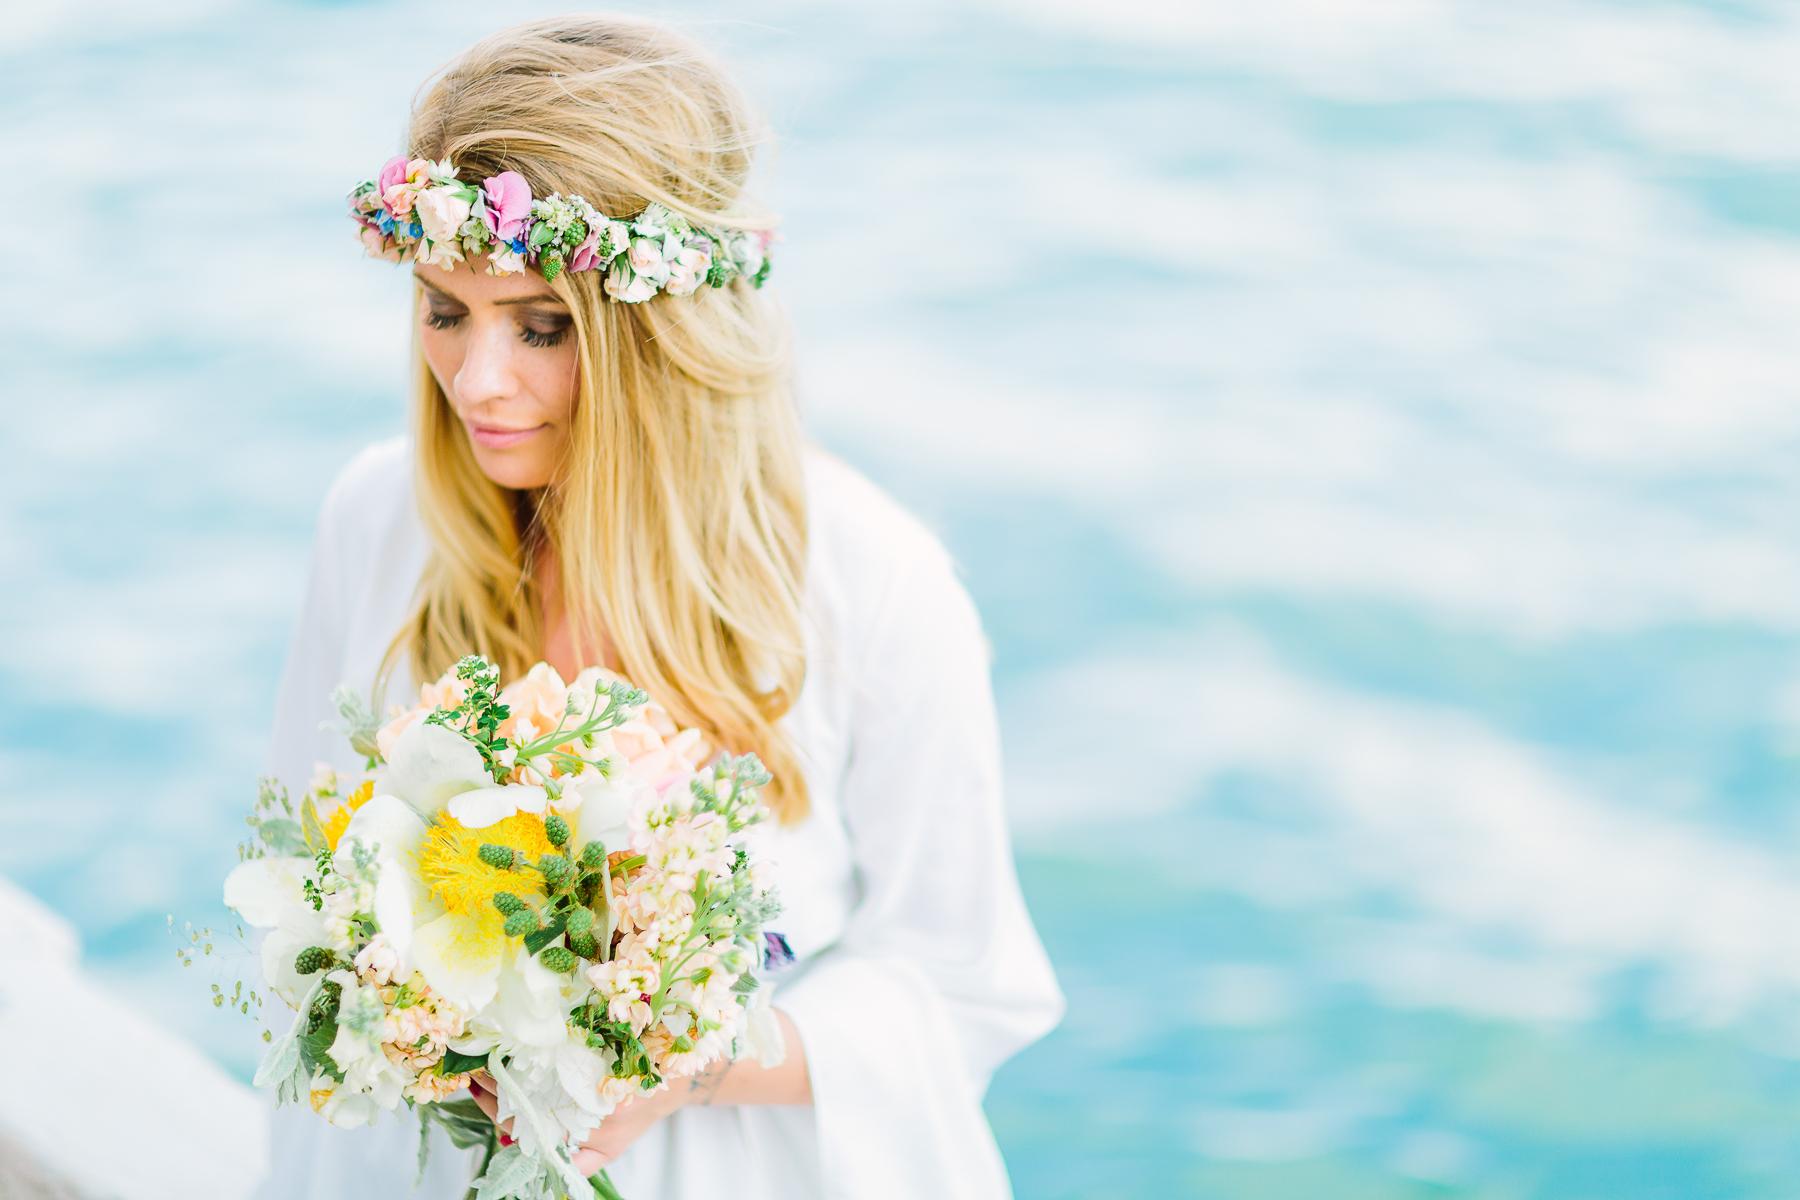 Hochzeitsfotograf Le Hai Linh Boho Chic After Wedding Shooting Venedig Timo Horn 1.FC Koeln 016.jpg